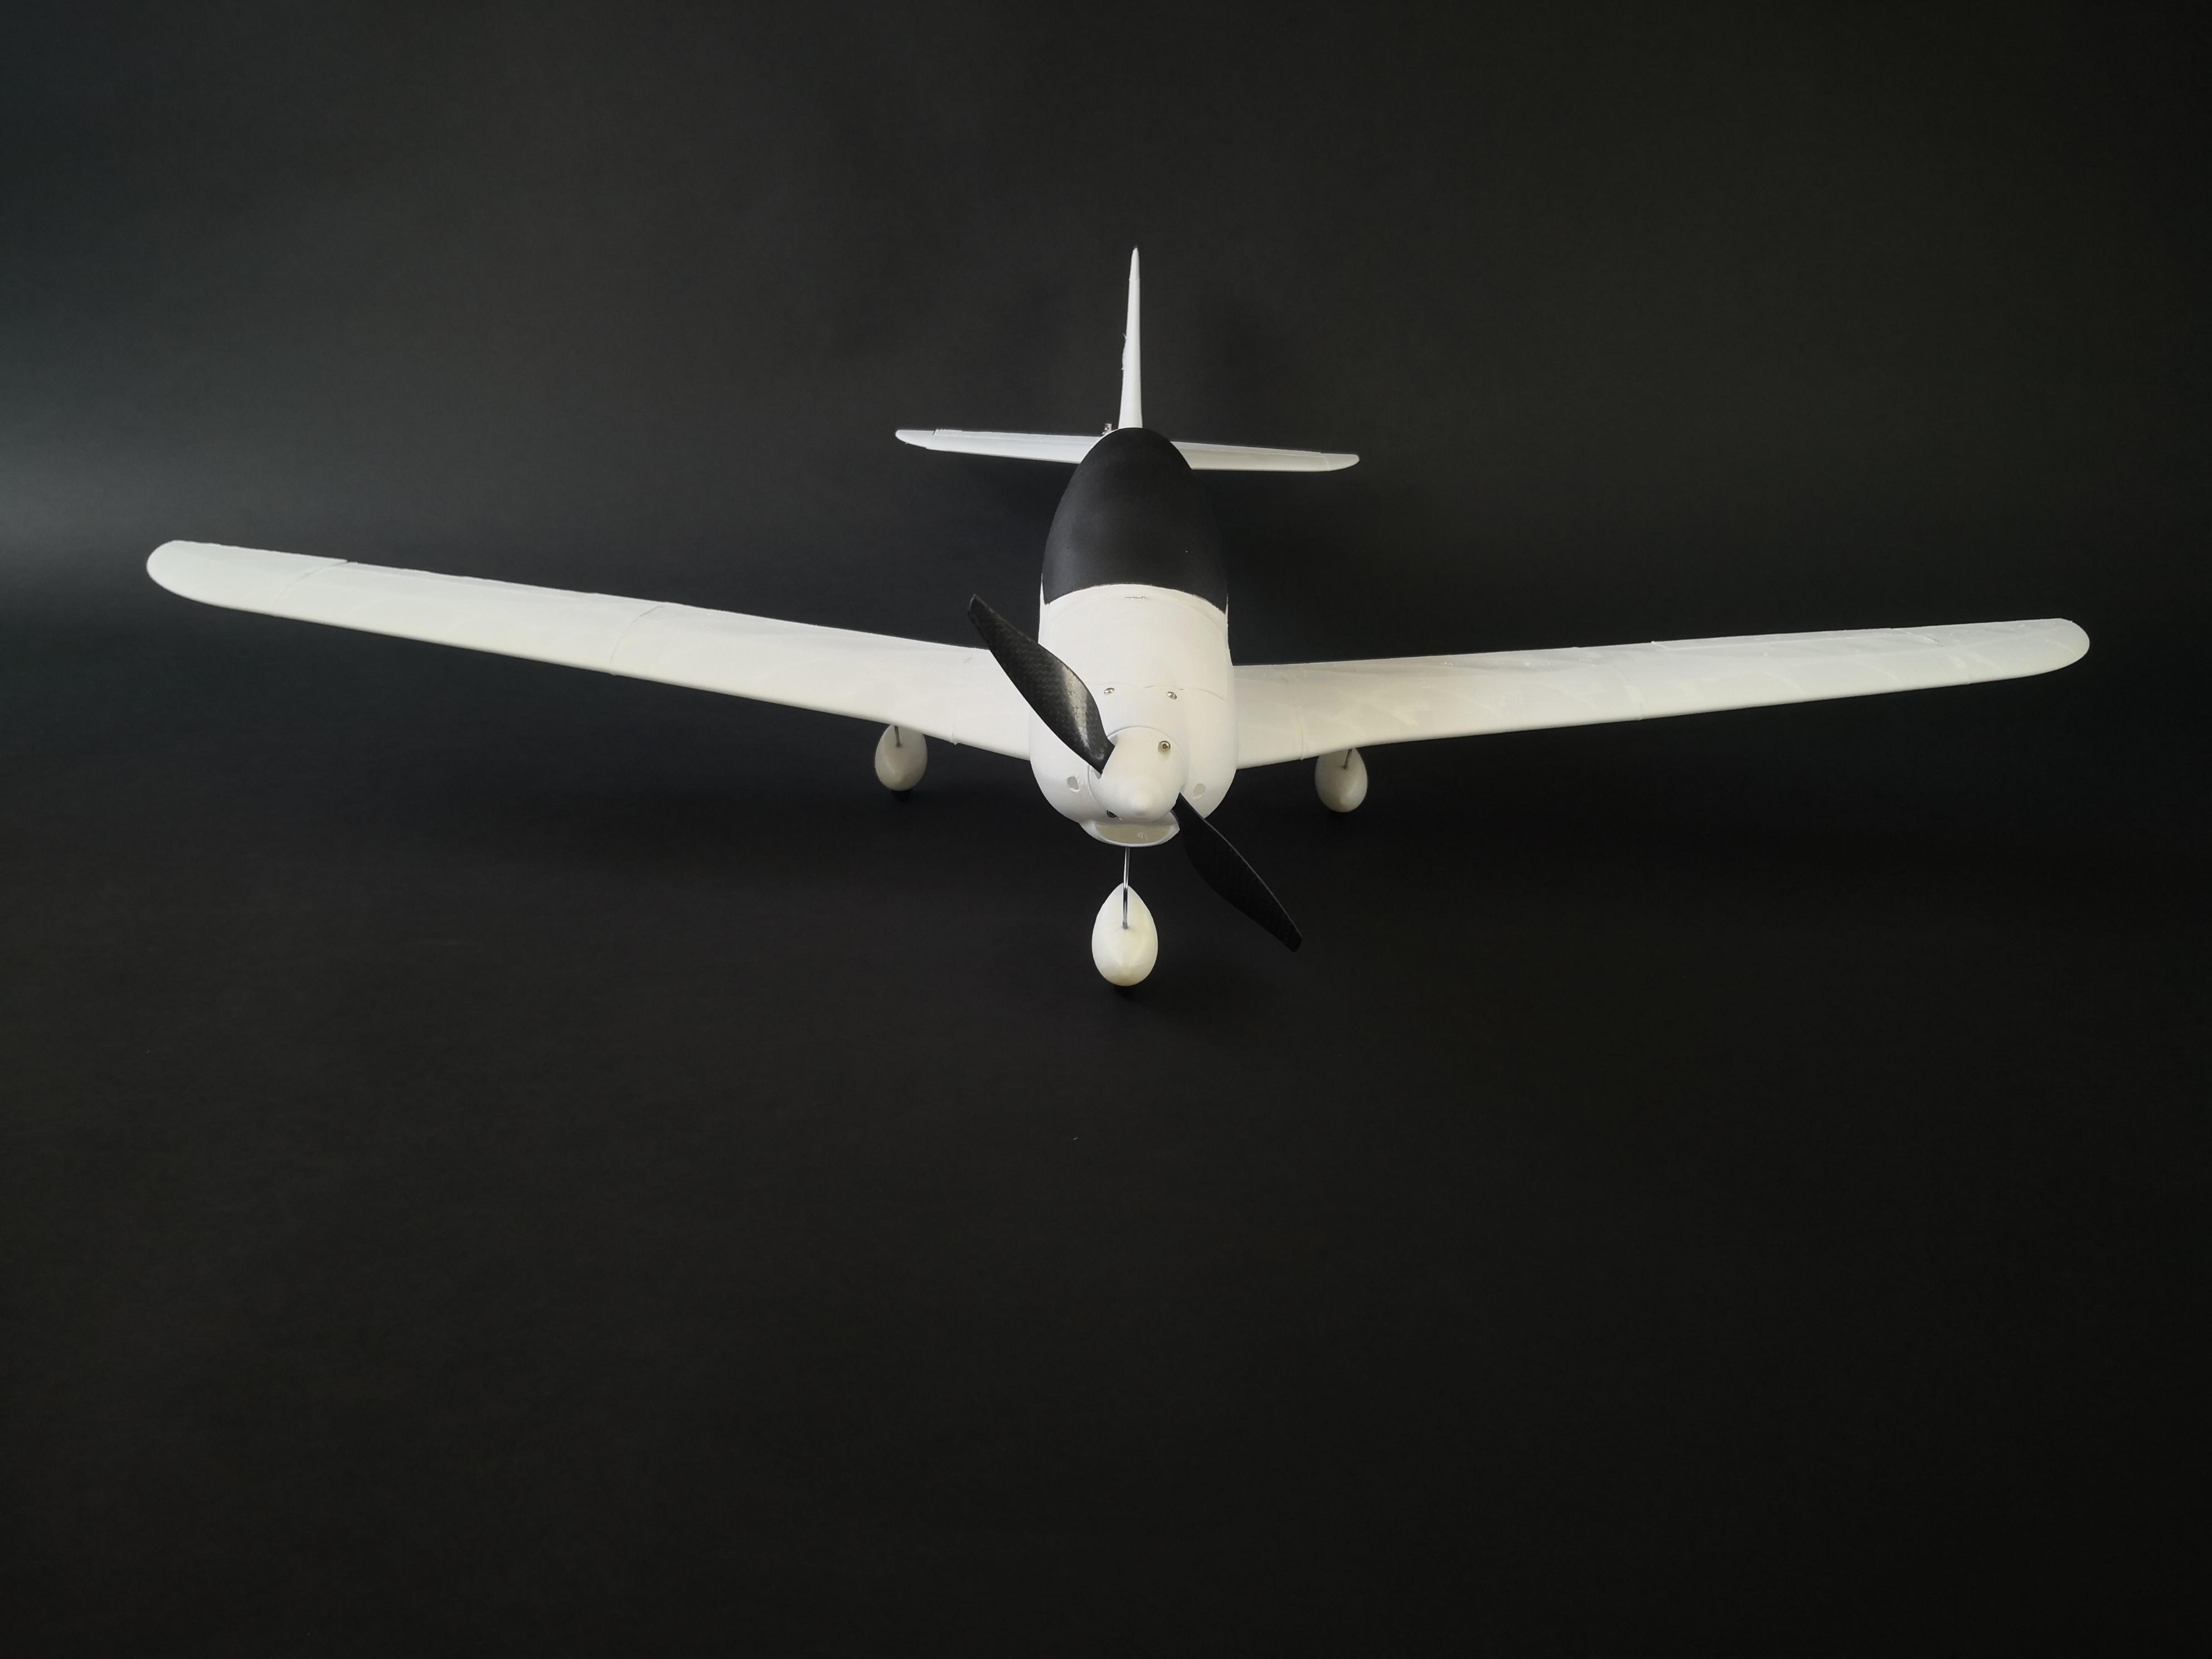 Printable RC light sport model